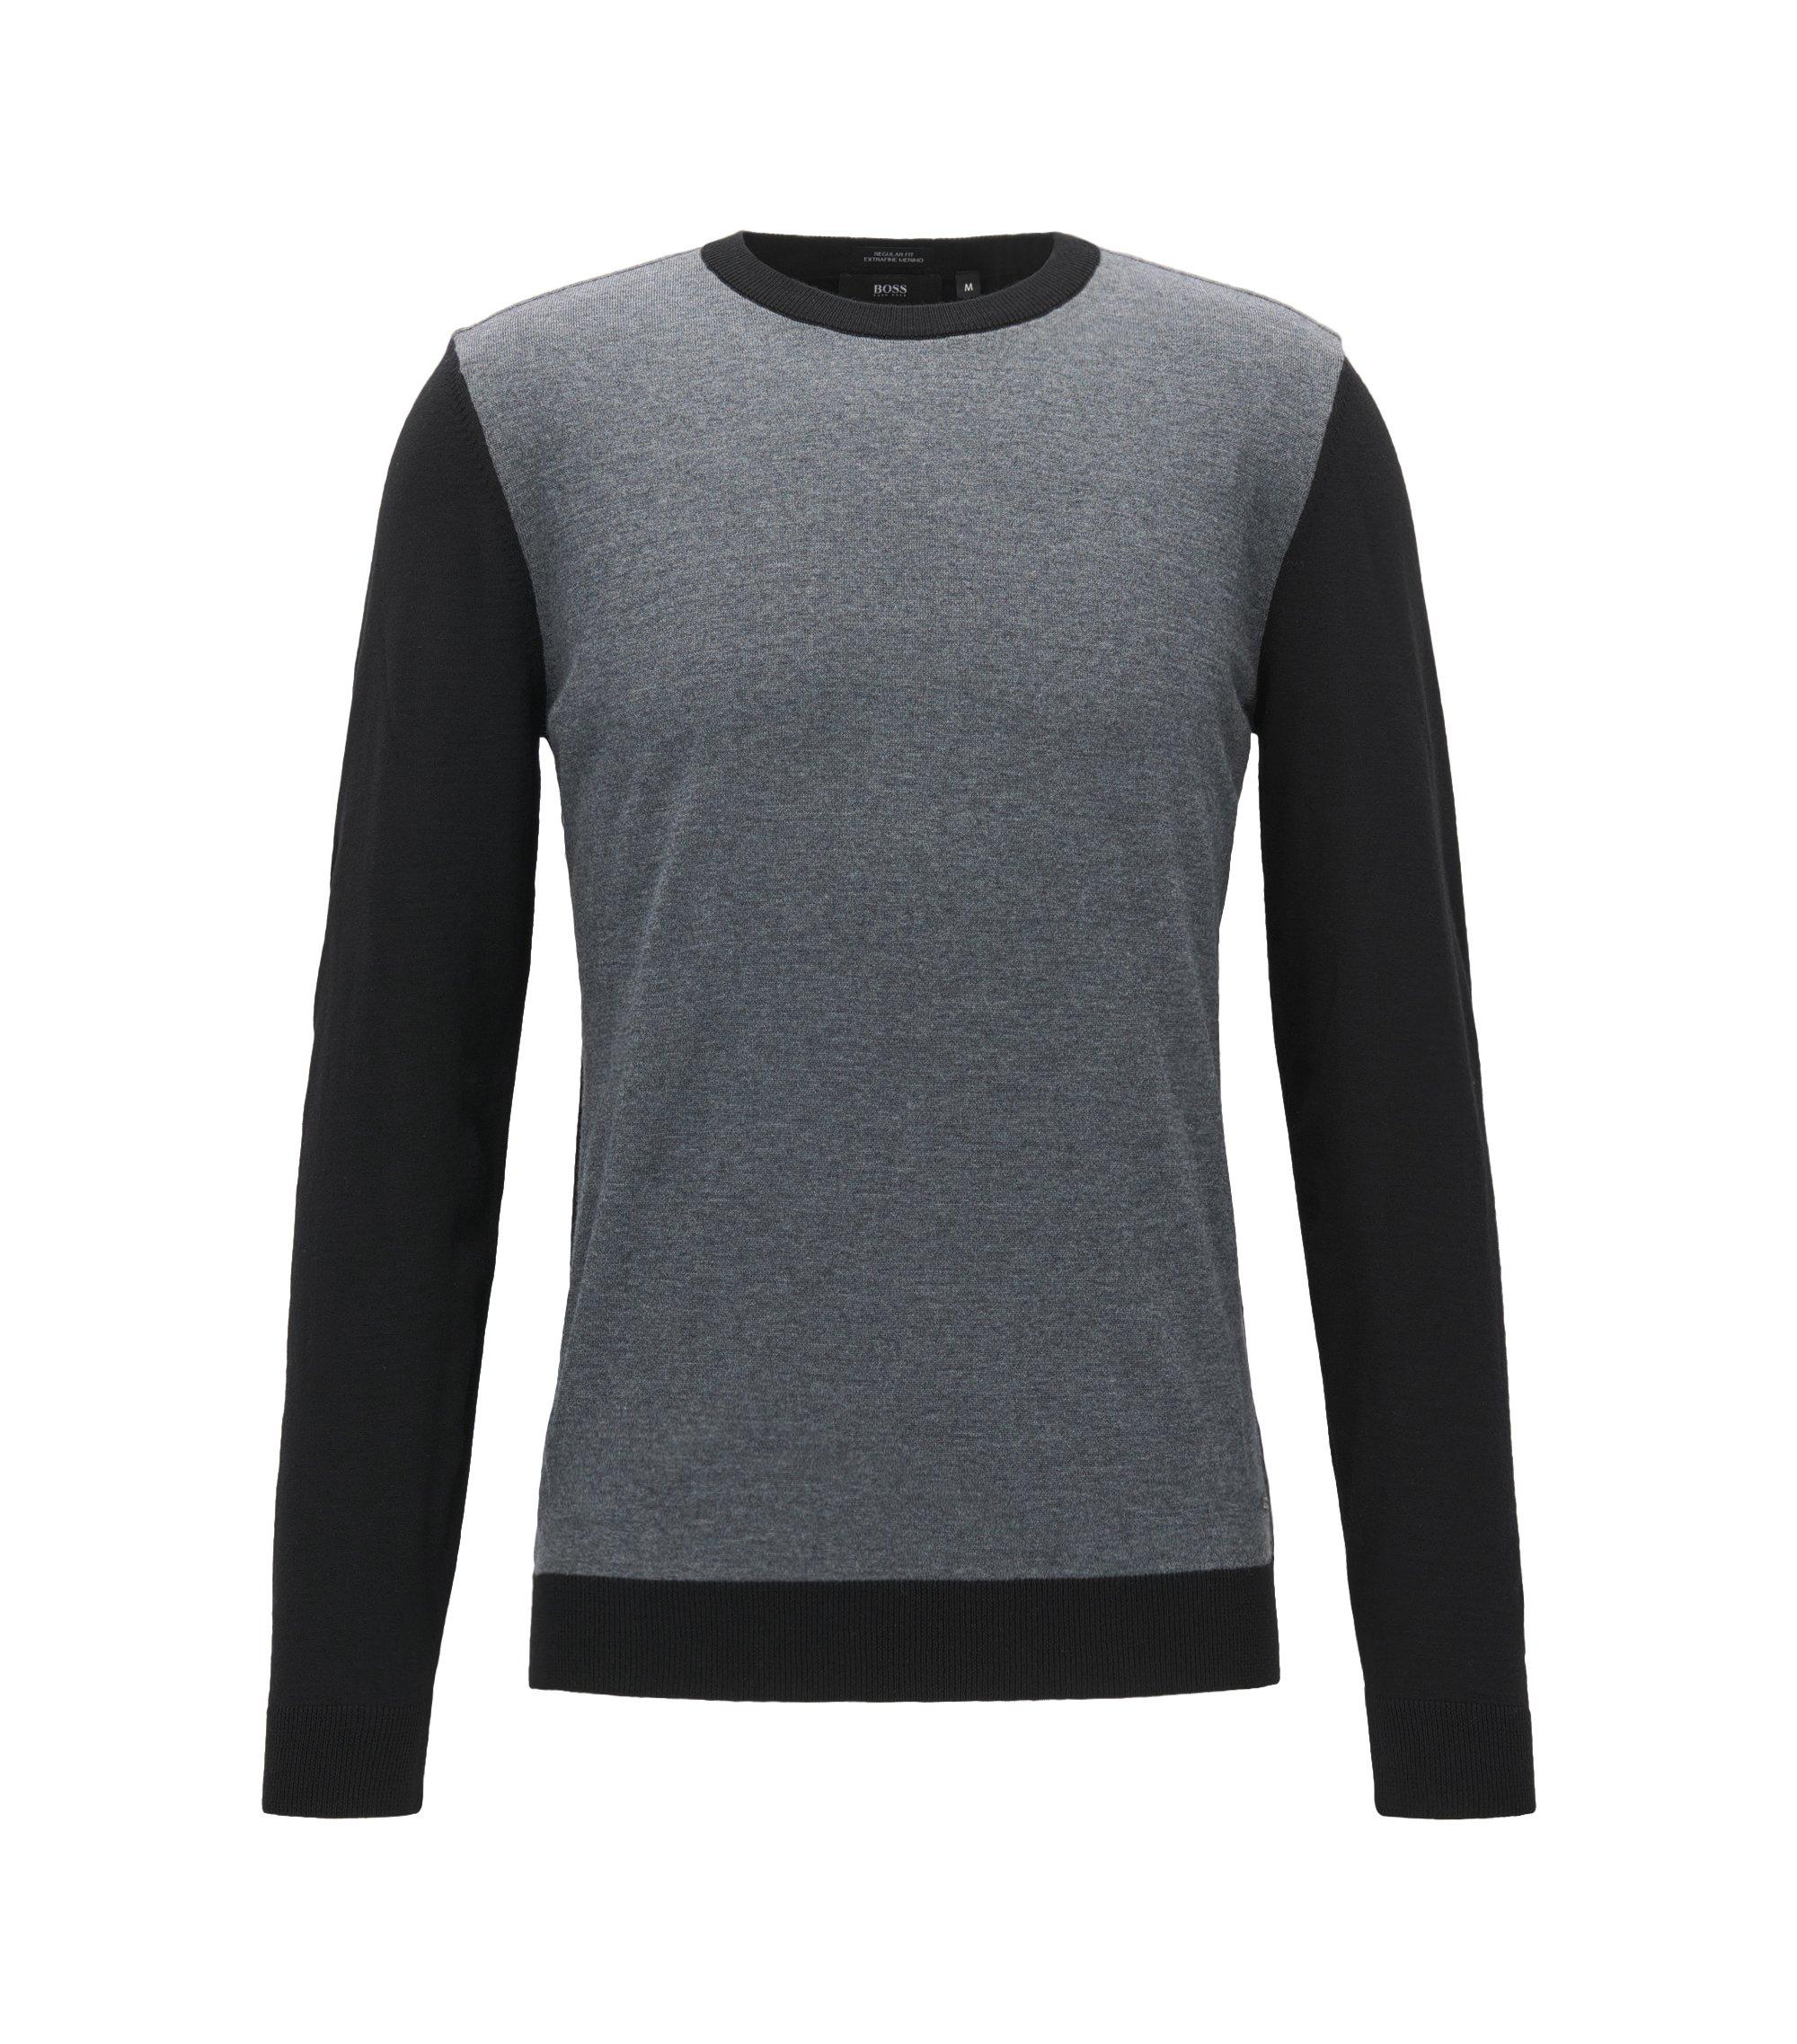 Colorblocked Merino Wool Sweater, Regular Fit | Nauro, Black